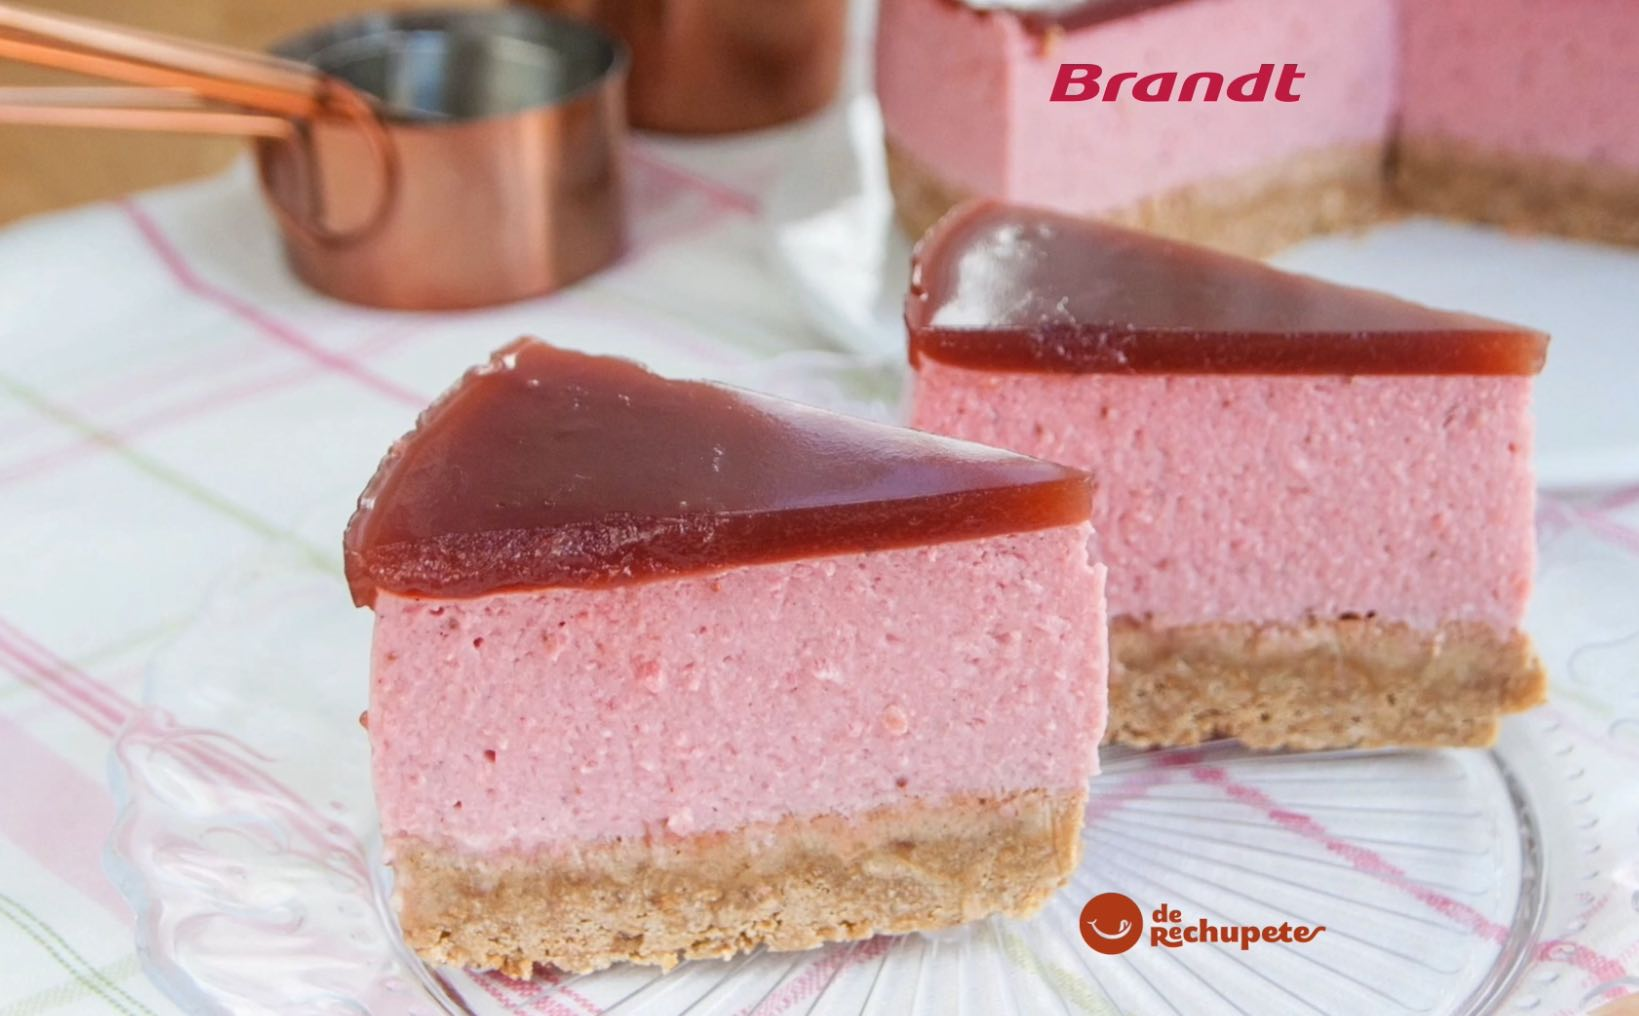 Receta Exprés Brandt: Tarta de fresas sin horno